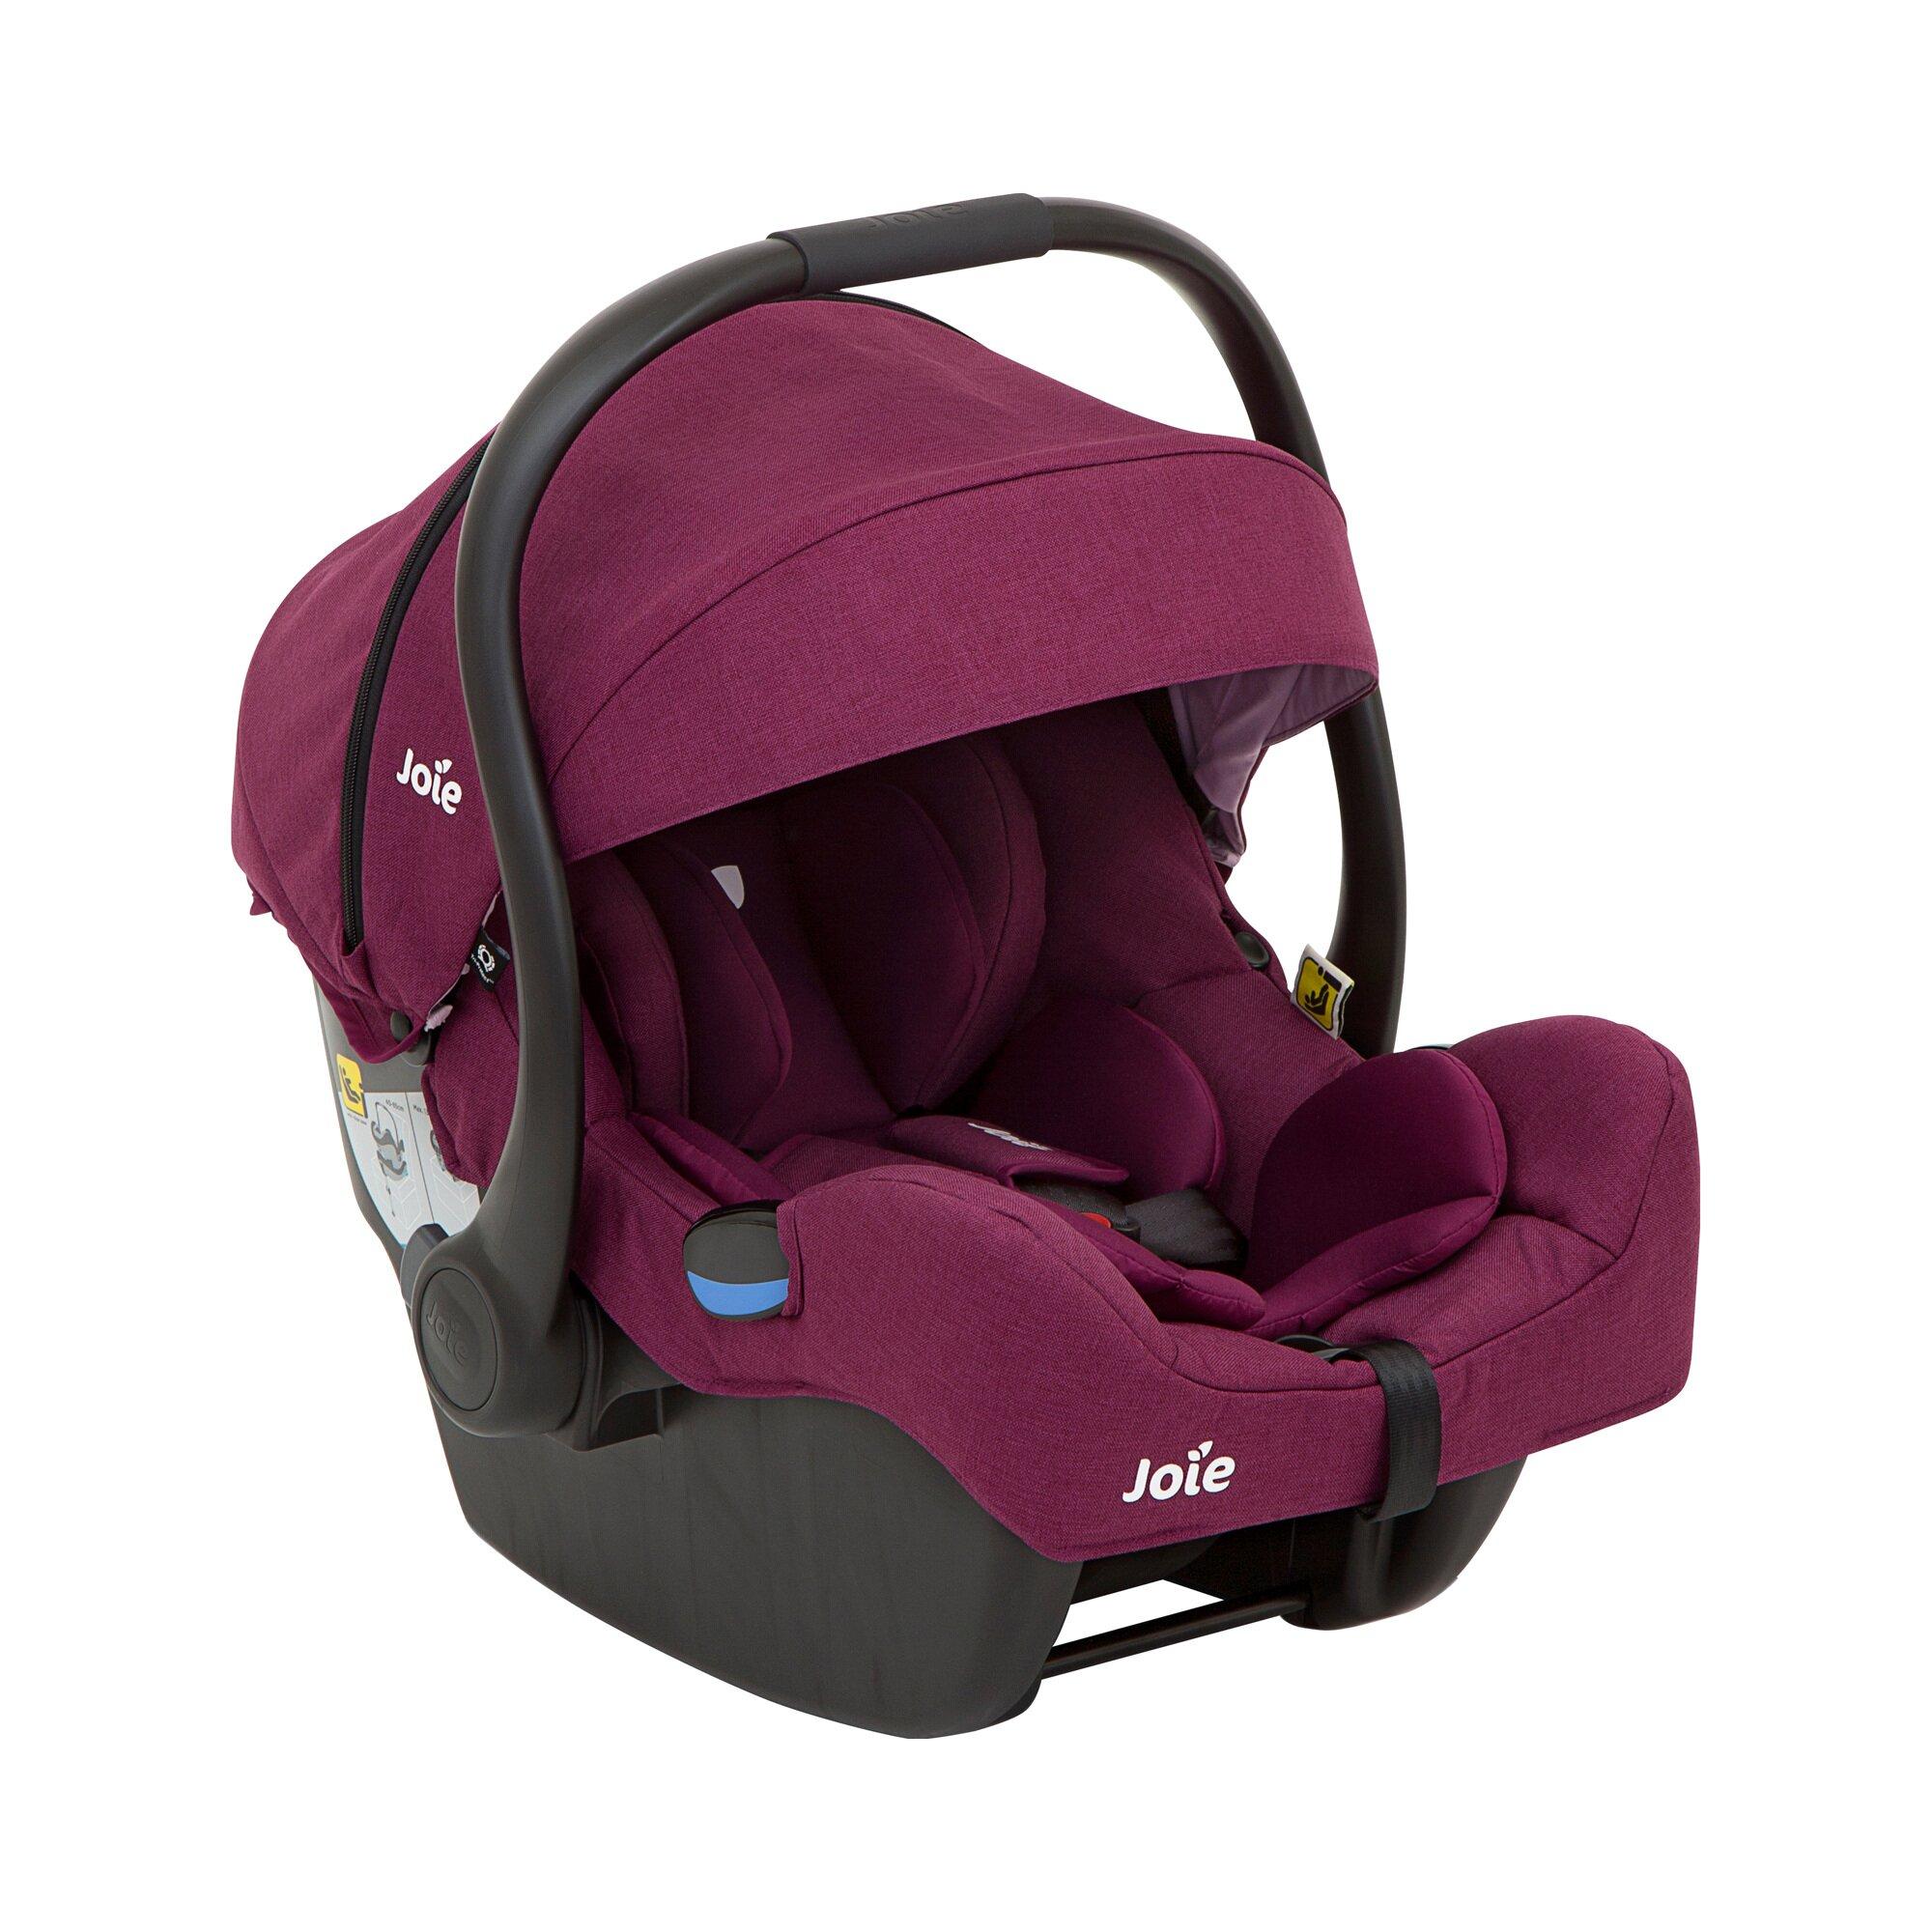 joie-i-gemm-i-size-babyschale-40cm-85cm-max-13kg-design-2018-lila